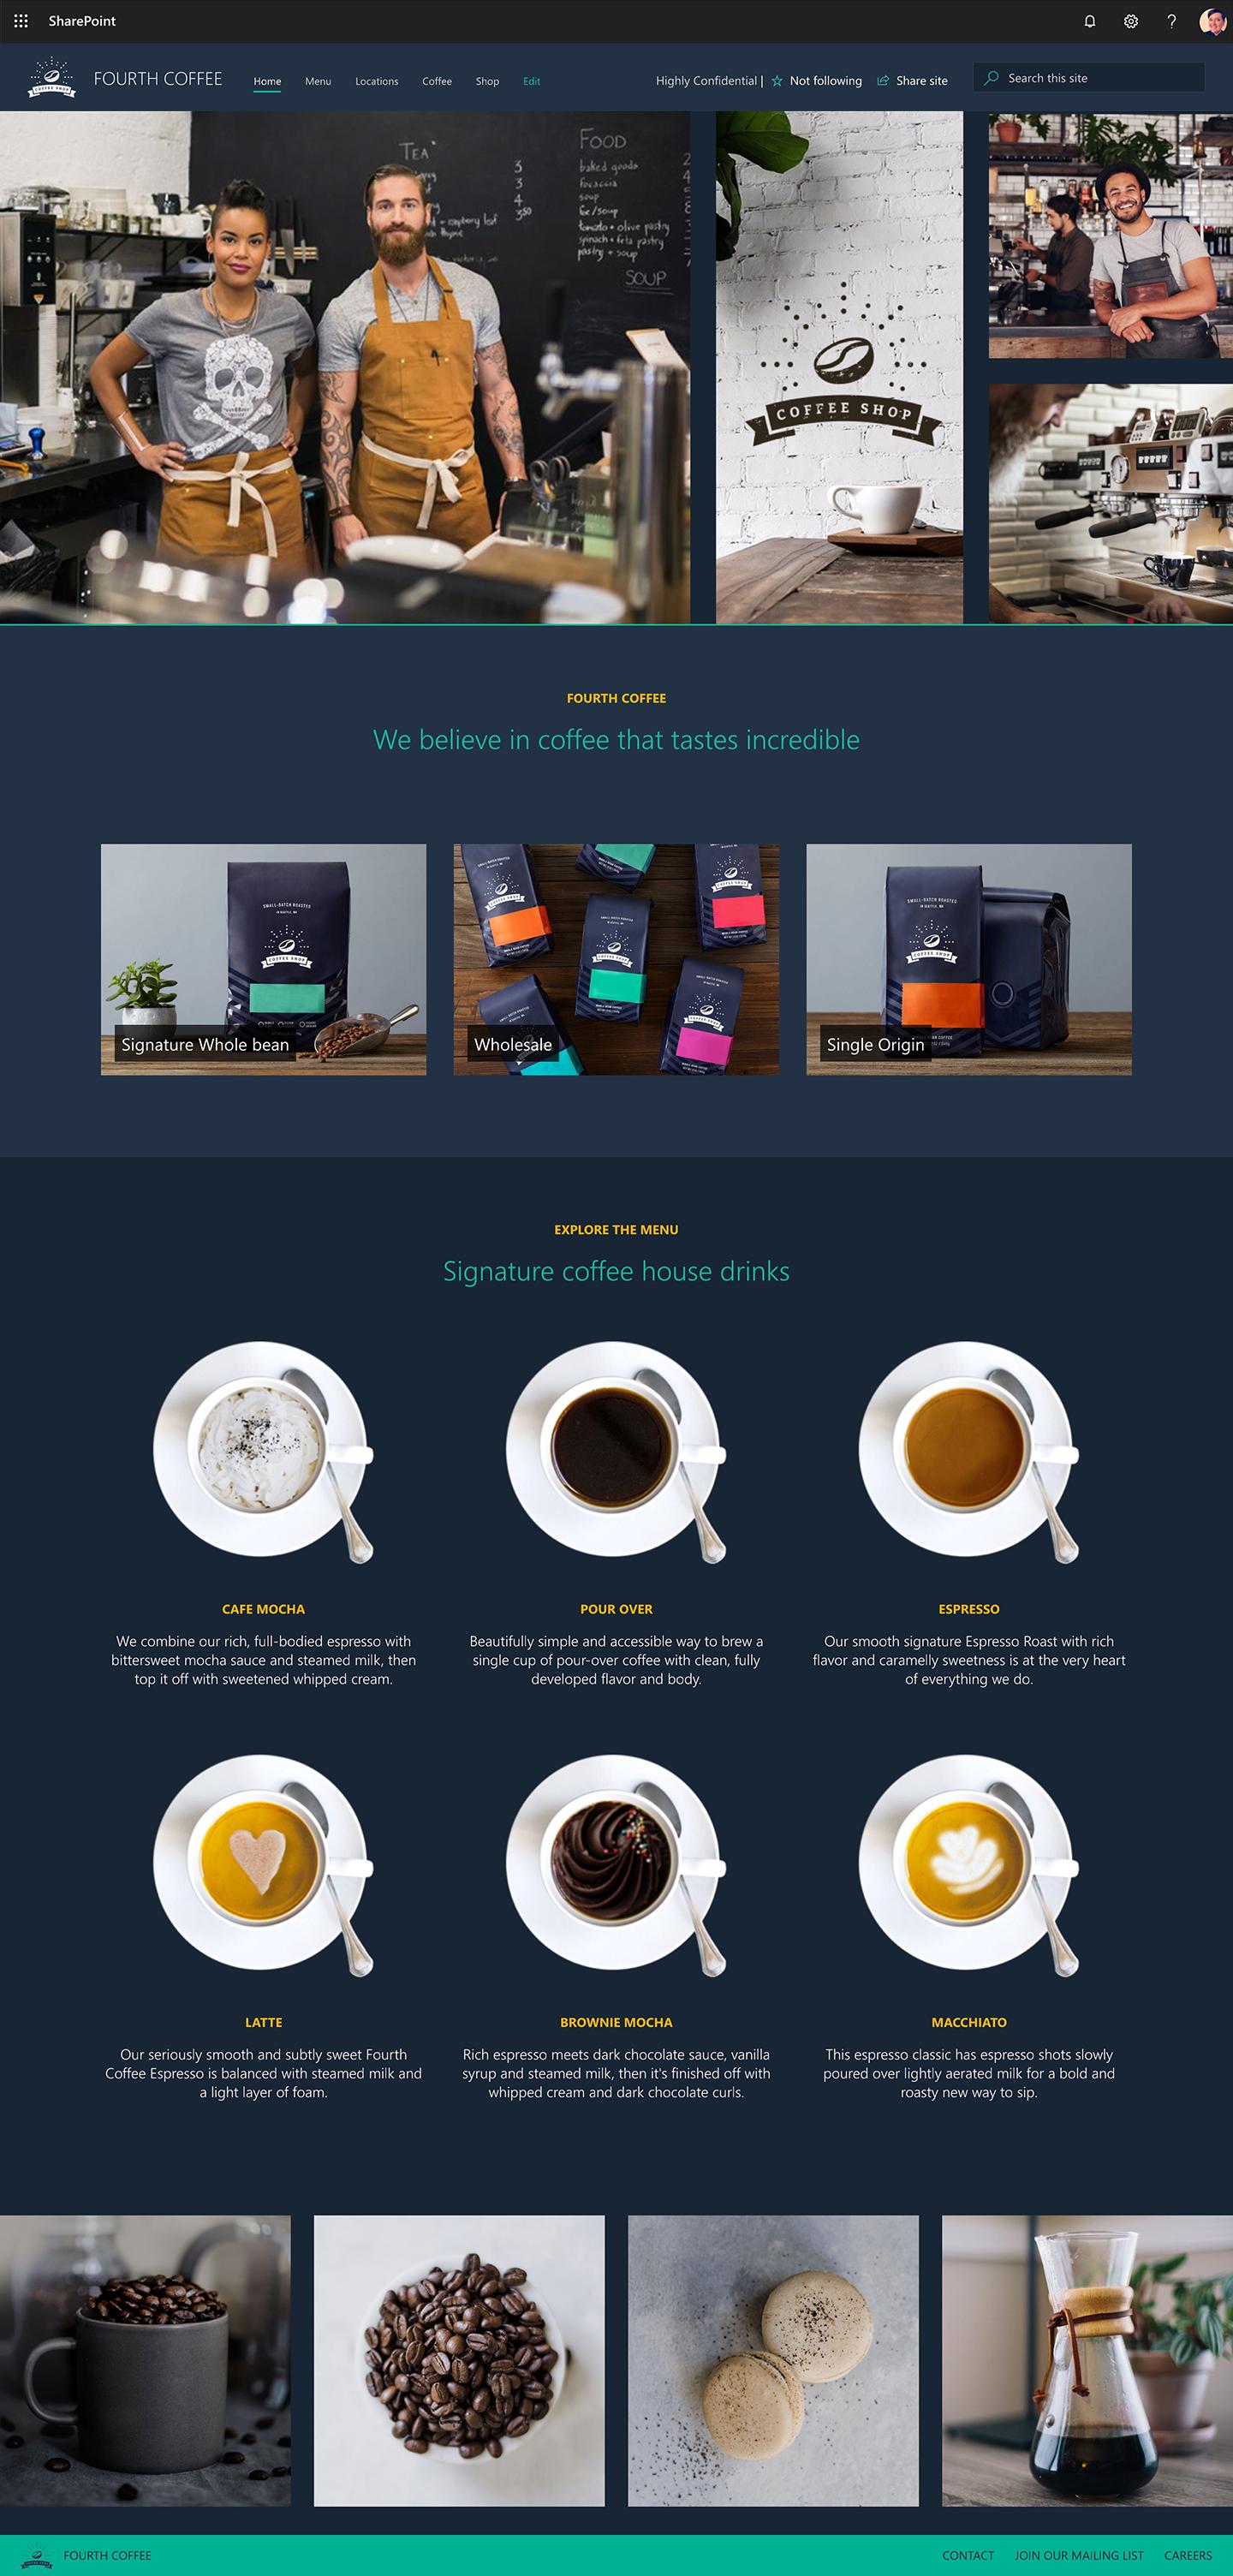 Fourthcoffee desktop